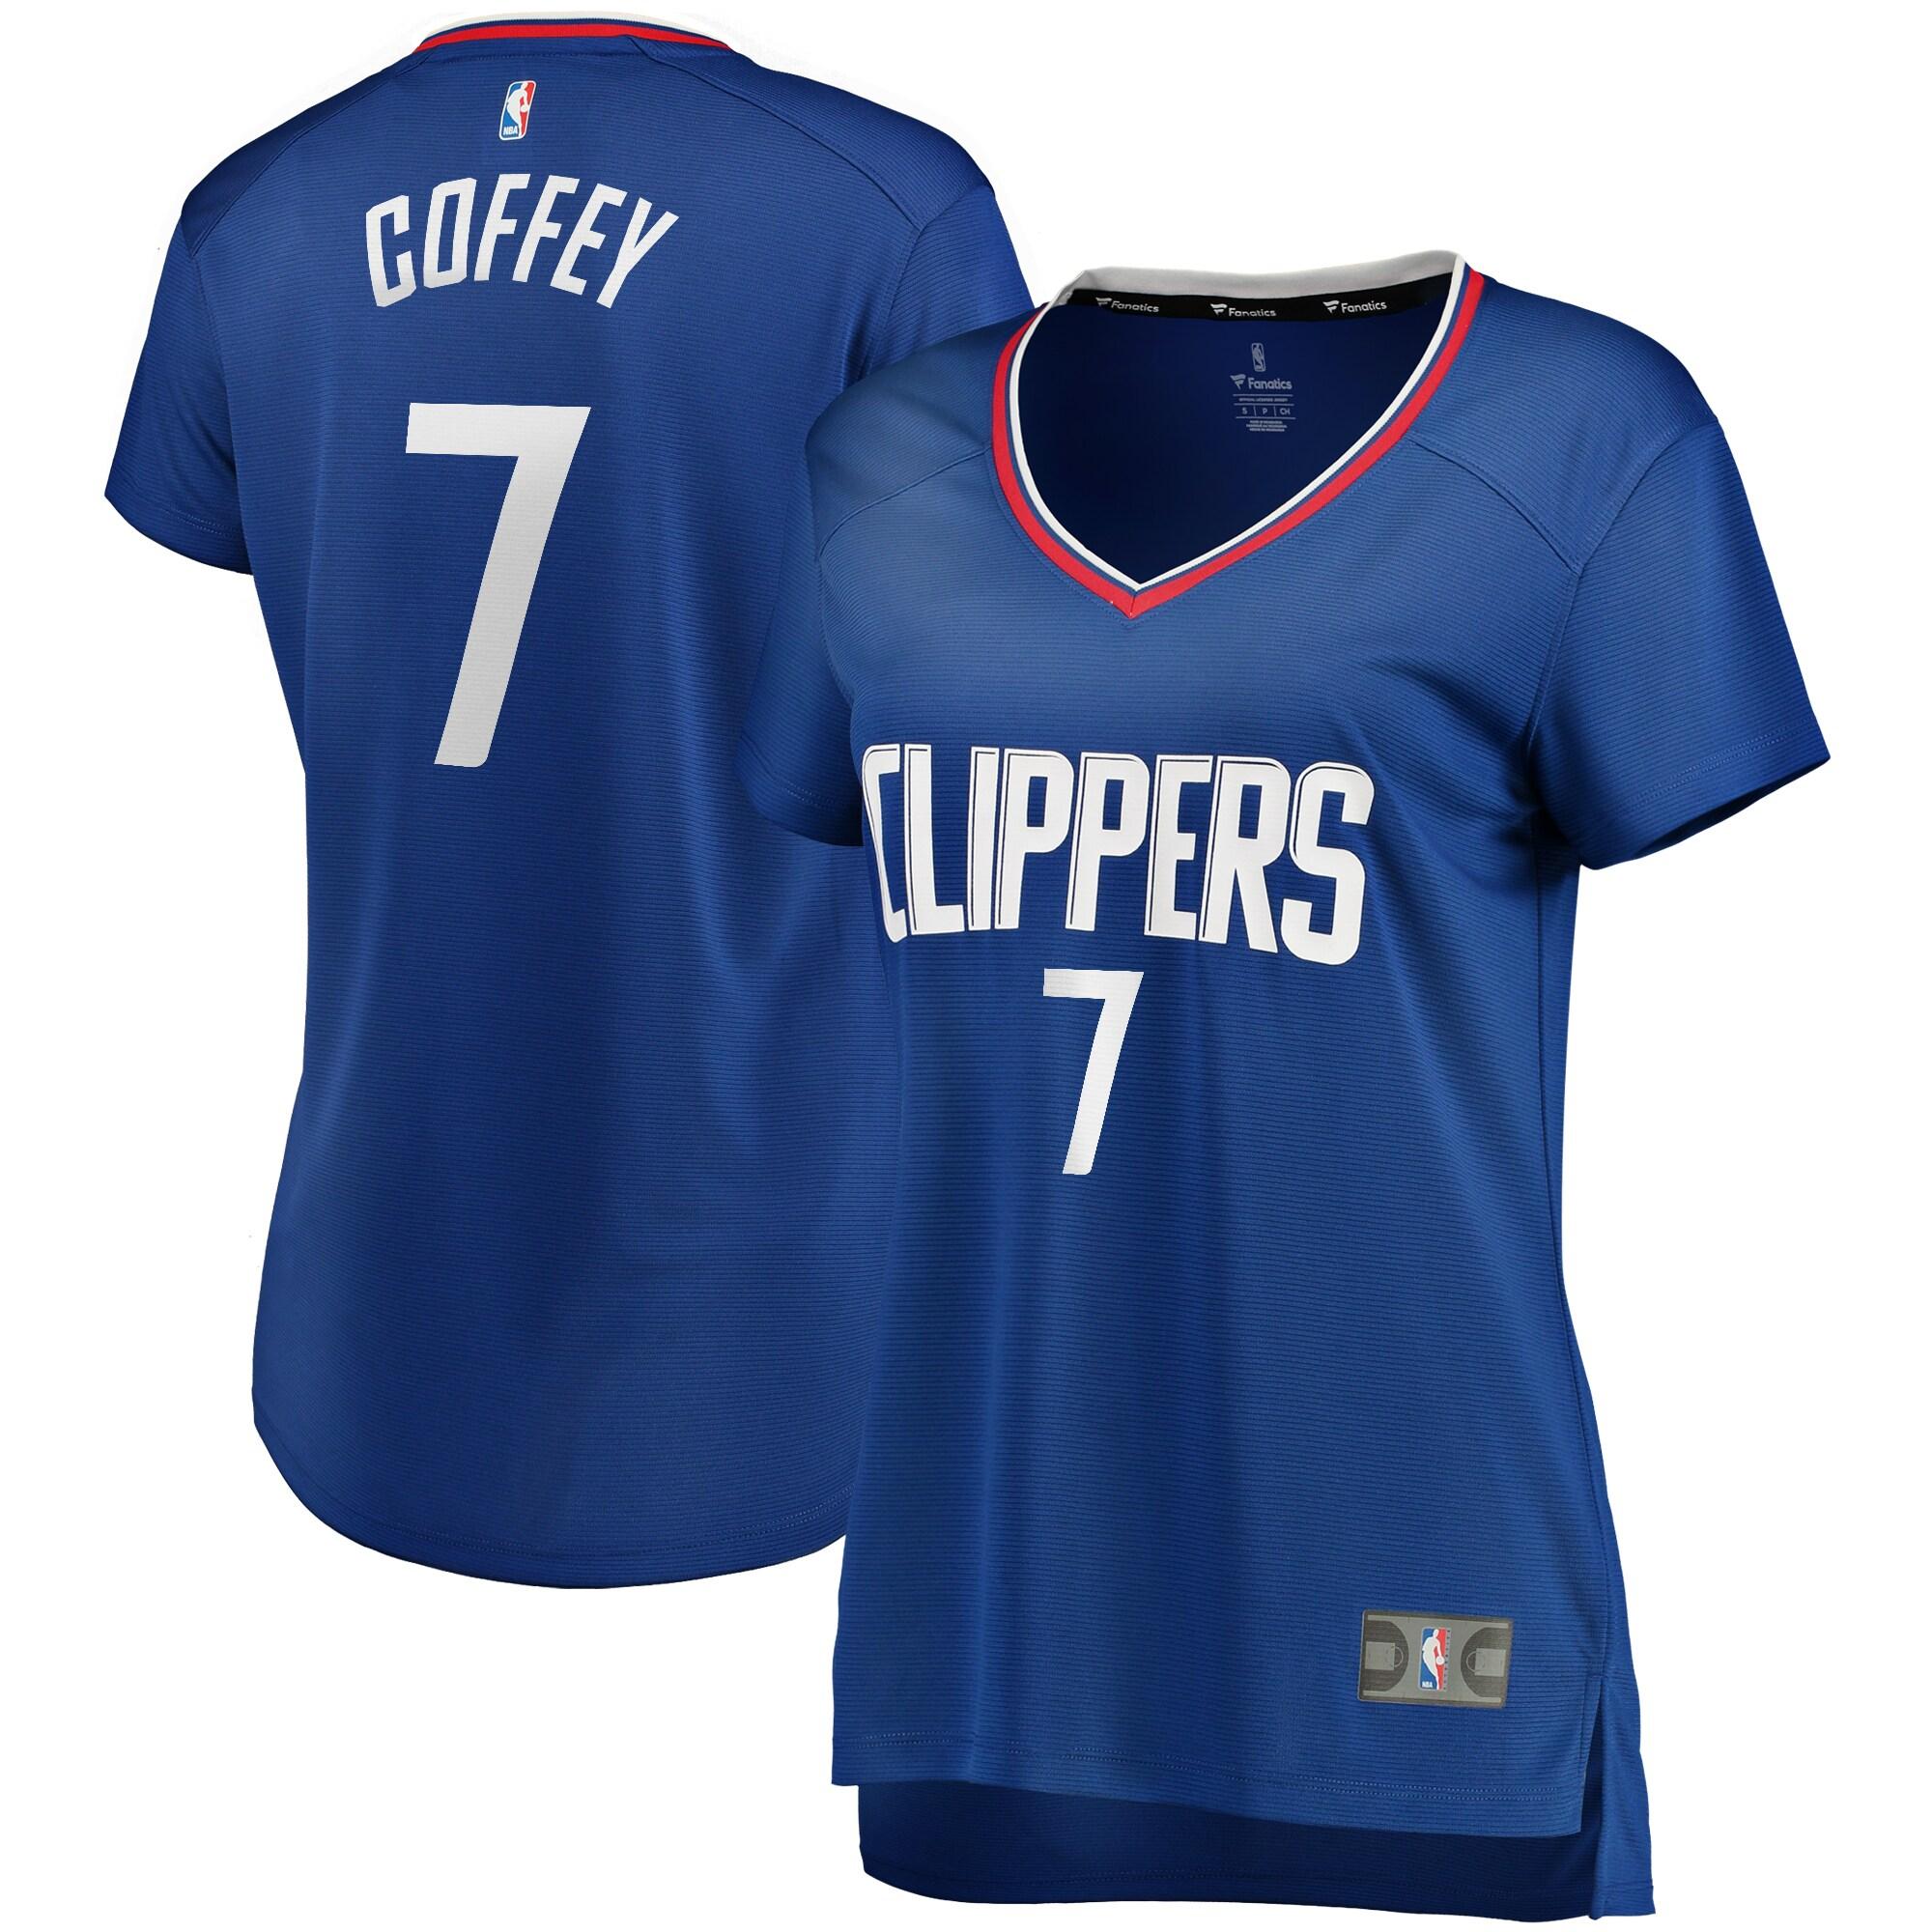 Amir Coffey LA Clippers Fanatics Branded Women's Fast Break Replica Player Jersey - Icon Edition - Royal